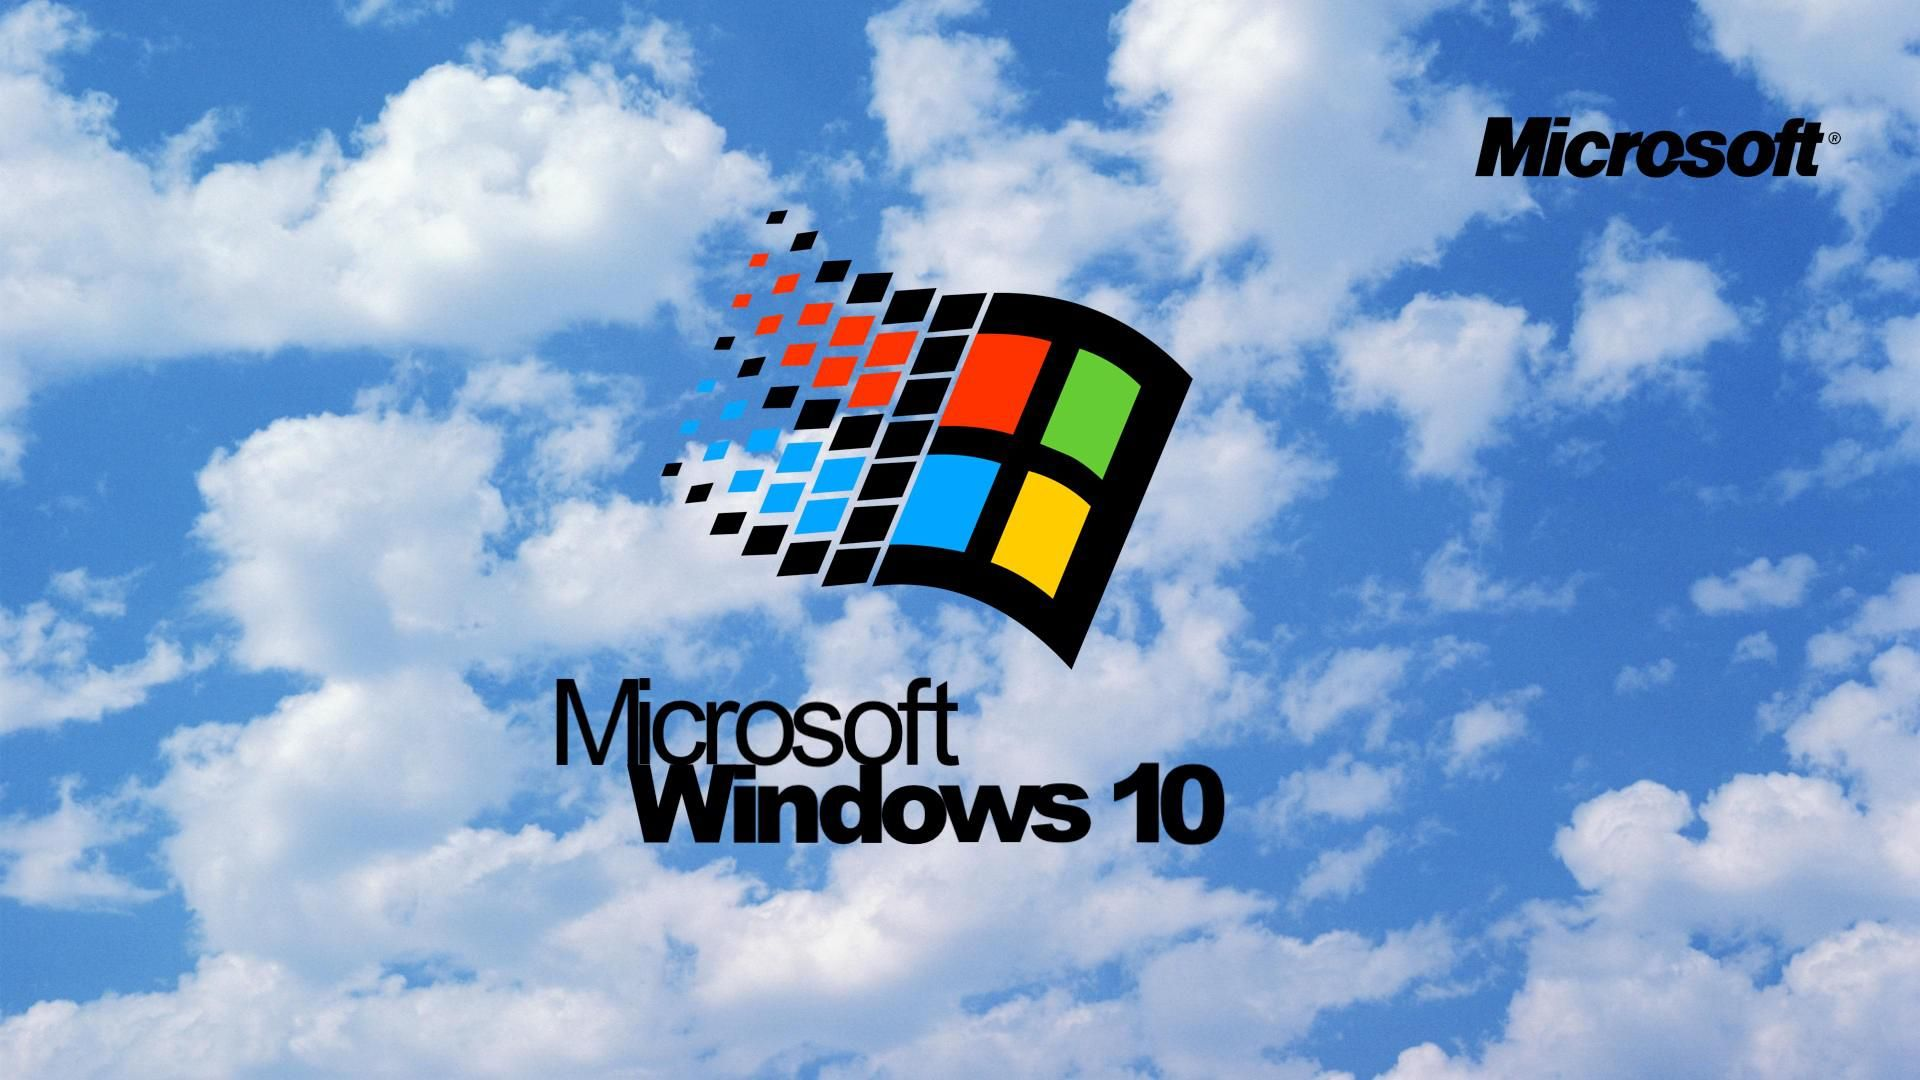 I Remade The Windows 98 Wallpaper For Windows 10 1920x1080 Aesthetic Desktop Wallpaper Desktop Wallpaper Art Desktop Wallpaper 1920x1080